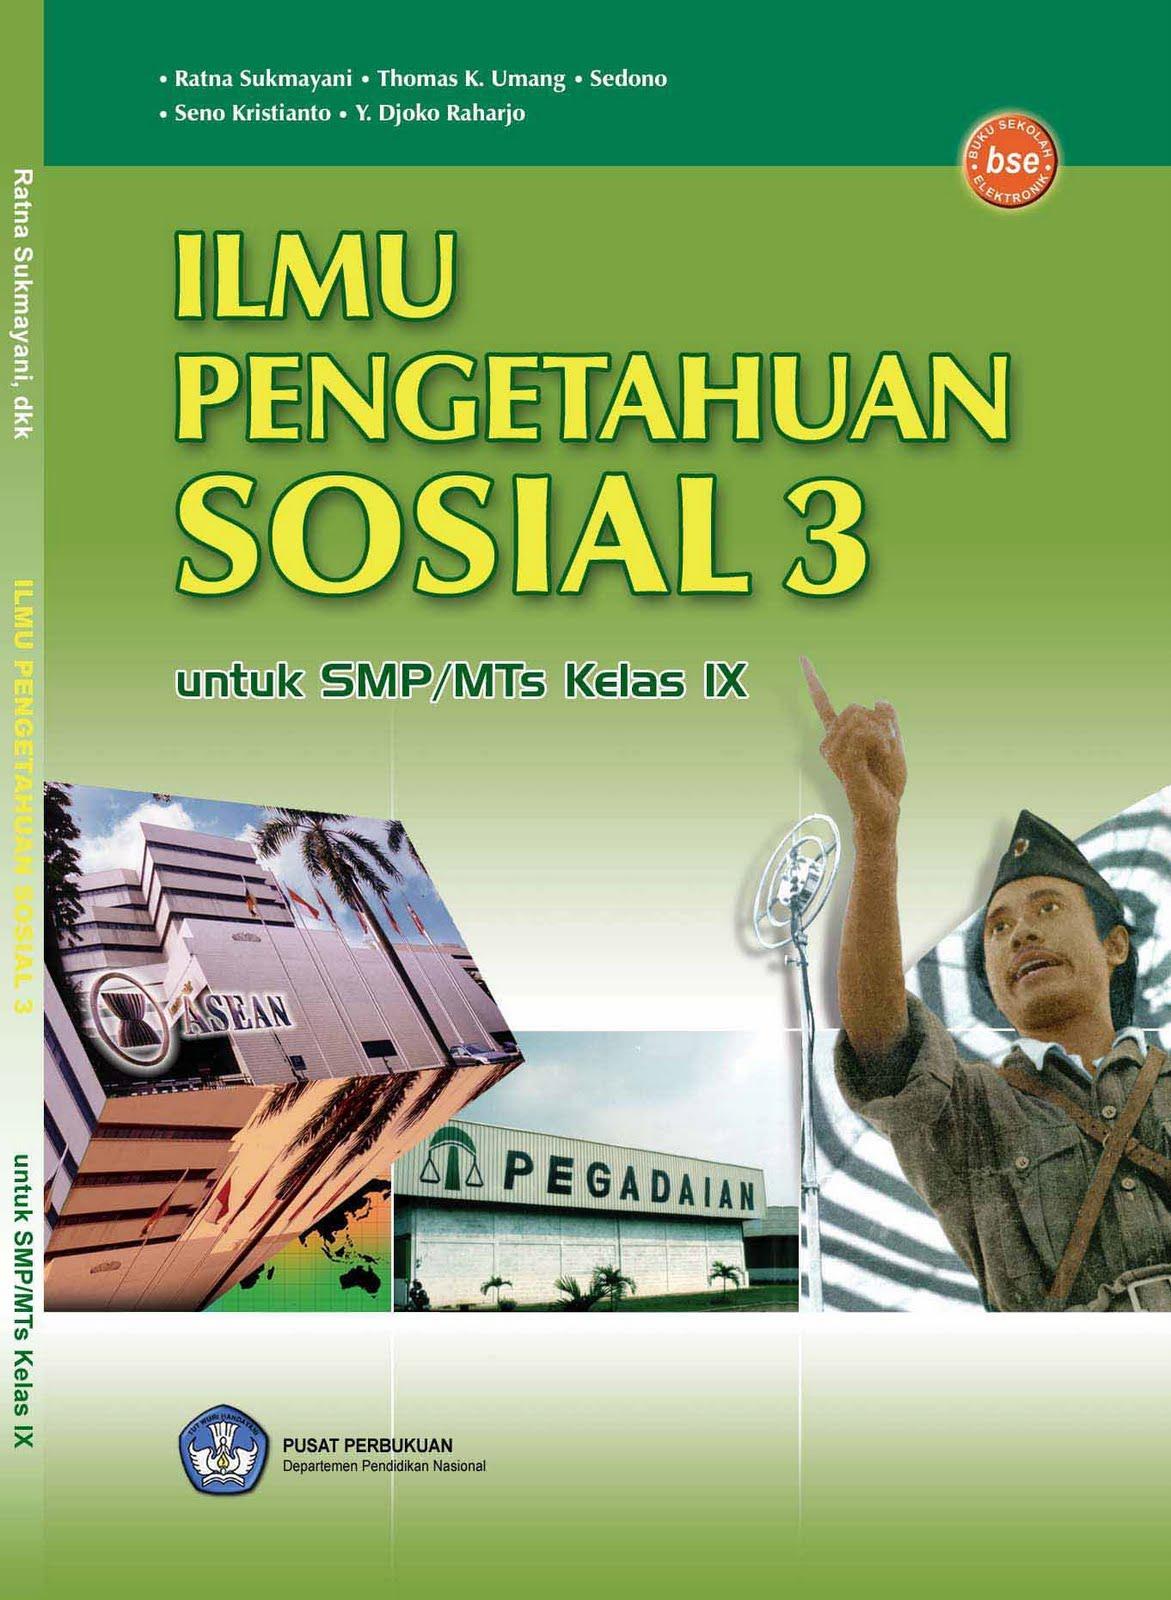 Buku Ilmu Pengetahuan Sosial (IPS) BSE untuk SMP/MTs Kelas 9 pengarang